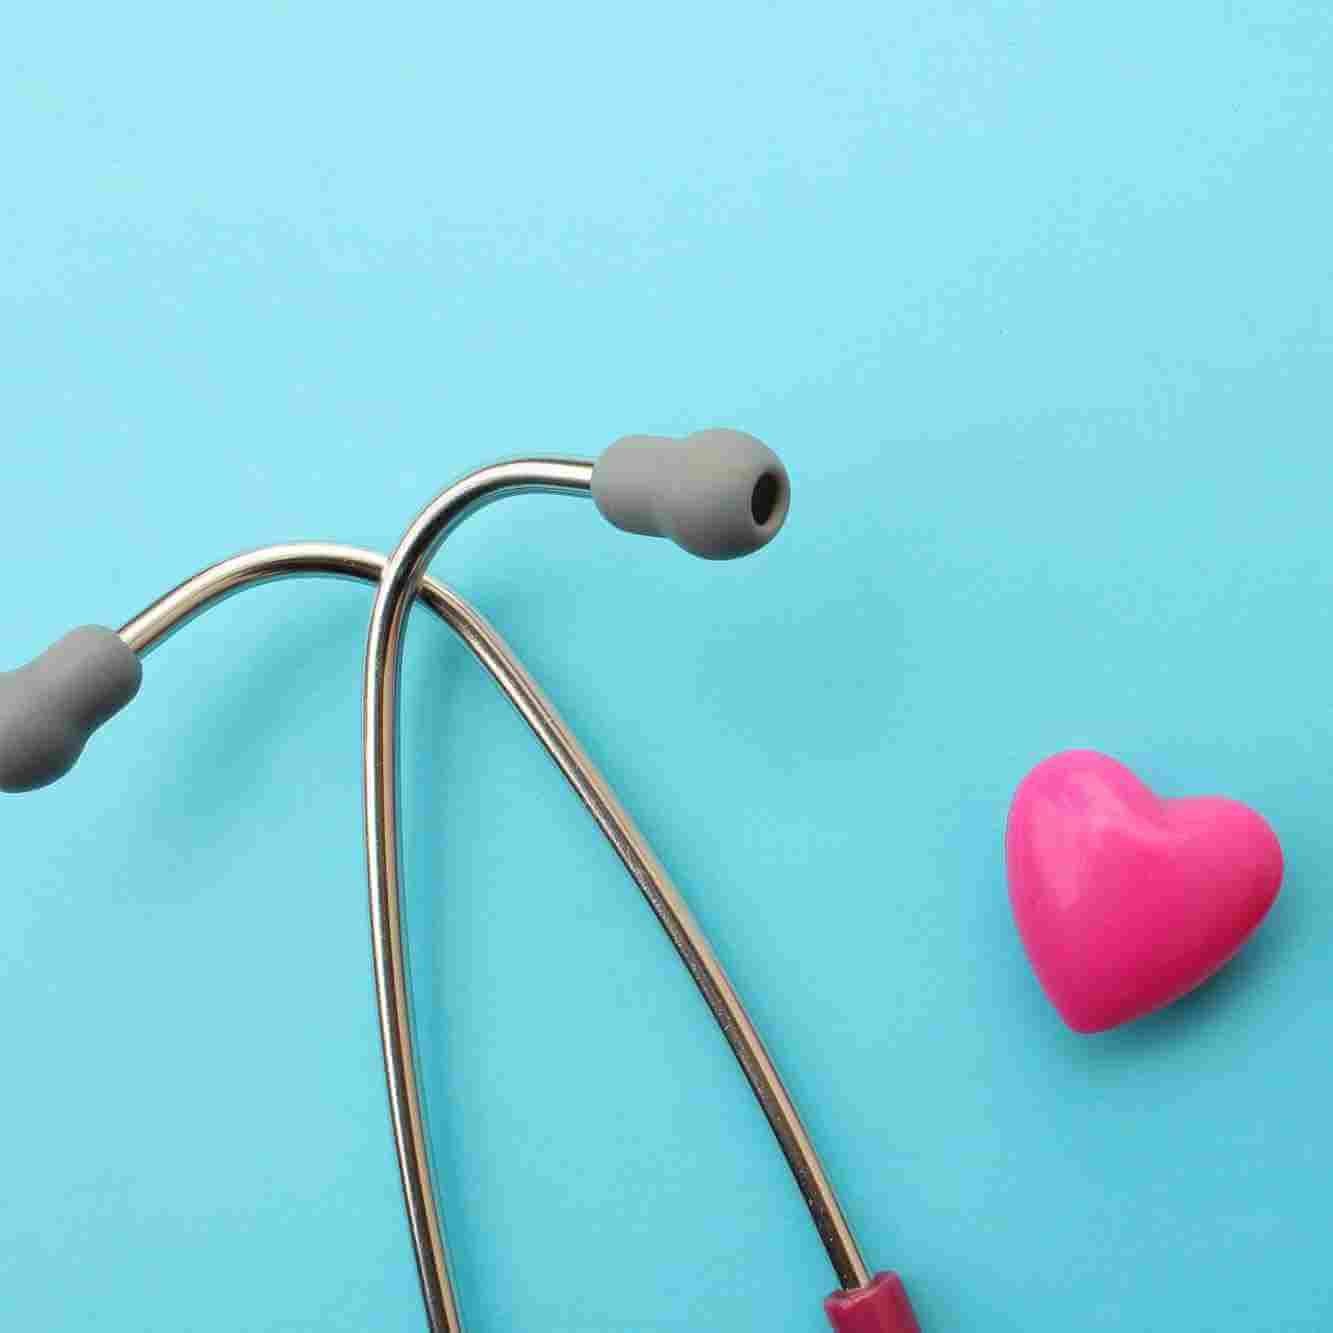 https://genetyca-icm.com/wp-content/uploads/2015/12/srce-i-stetoskop.jpg